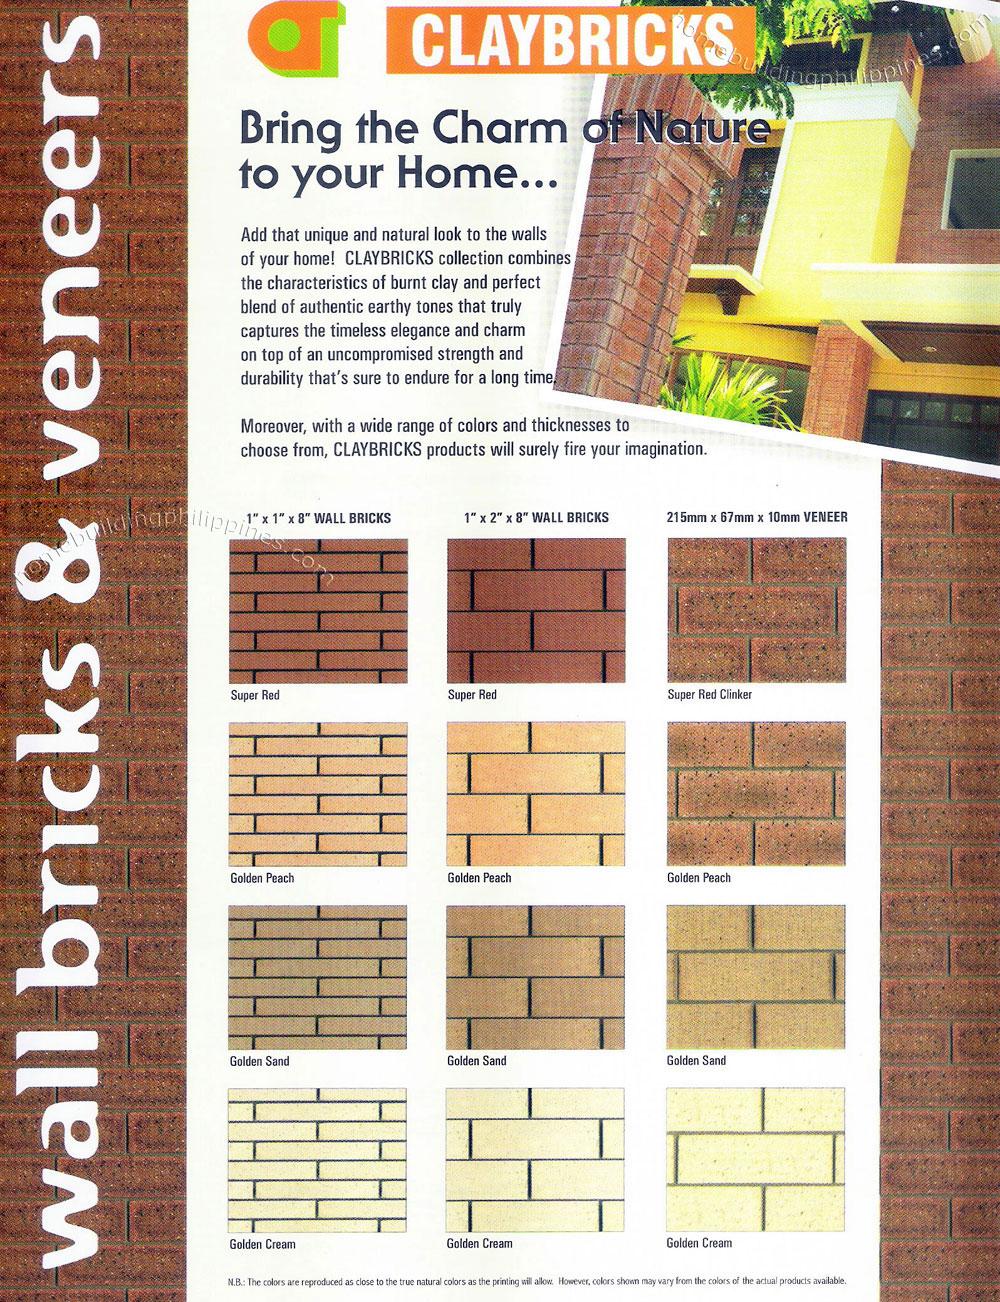 claybricks wall bricks amp veneers   natural look burnt clay